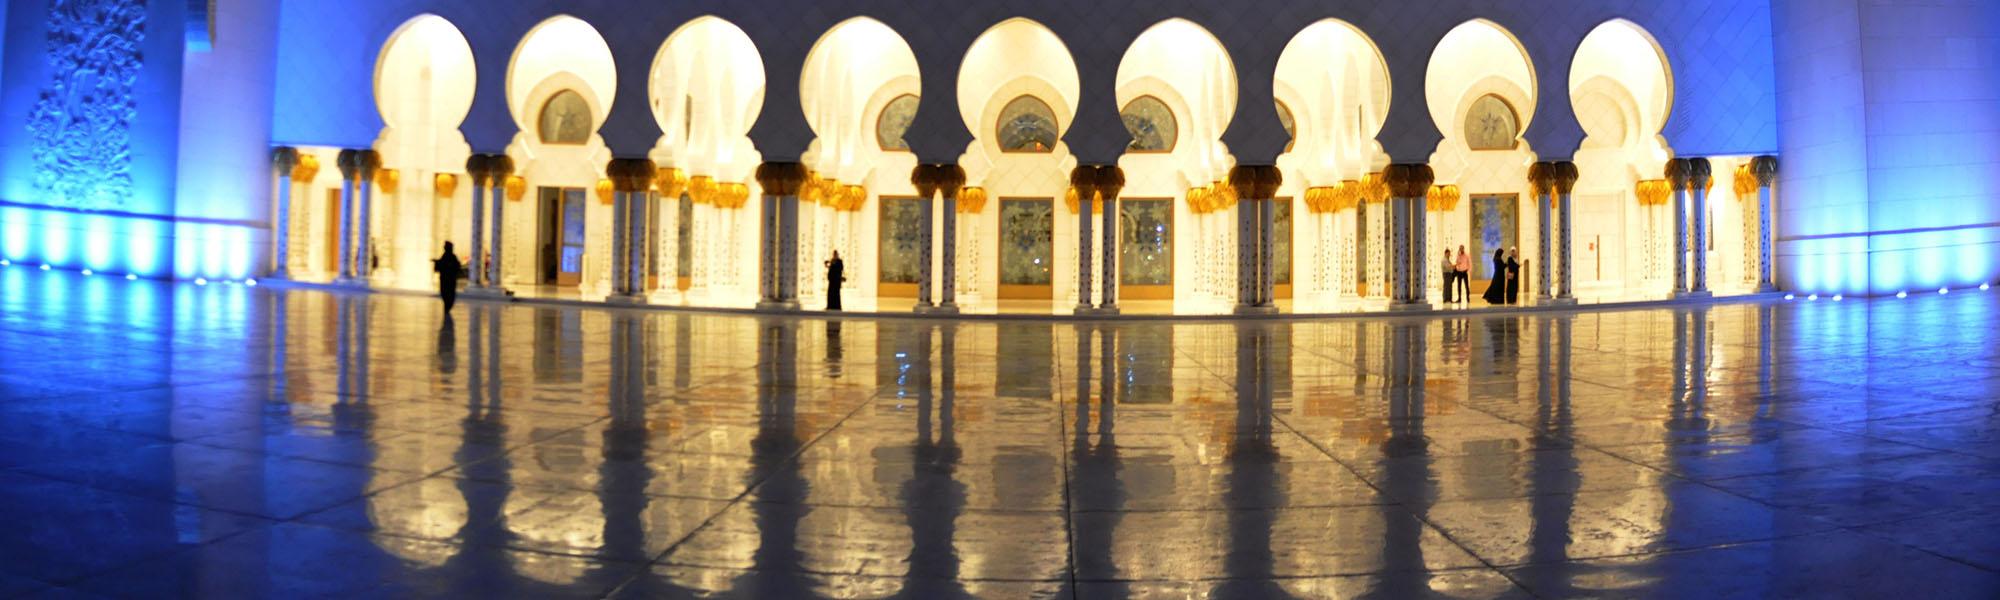 Sheikh Zayed Grand Mosque Abu Dhabi Culture